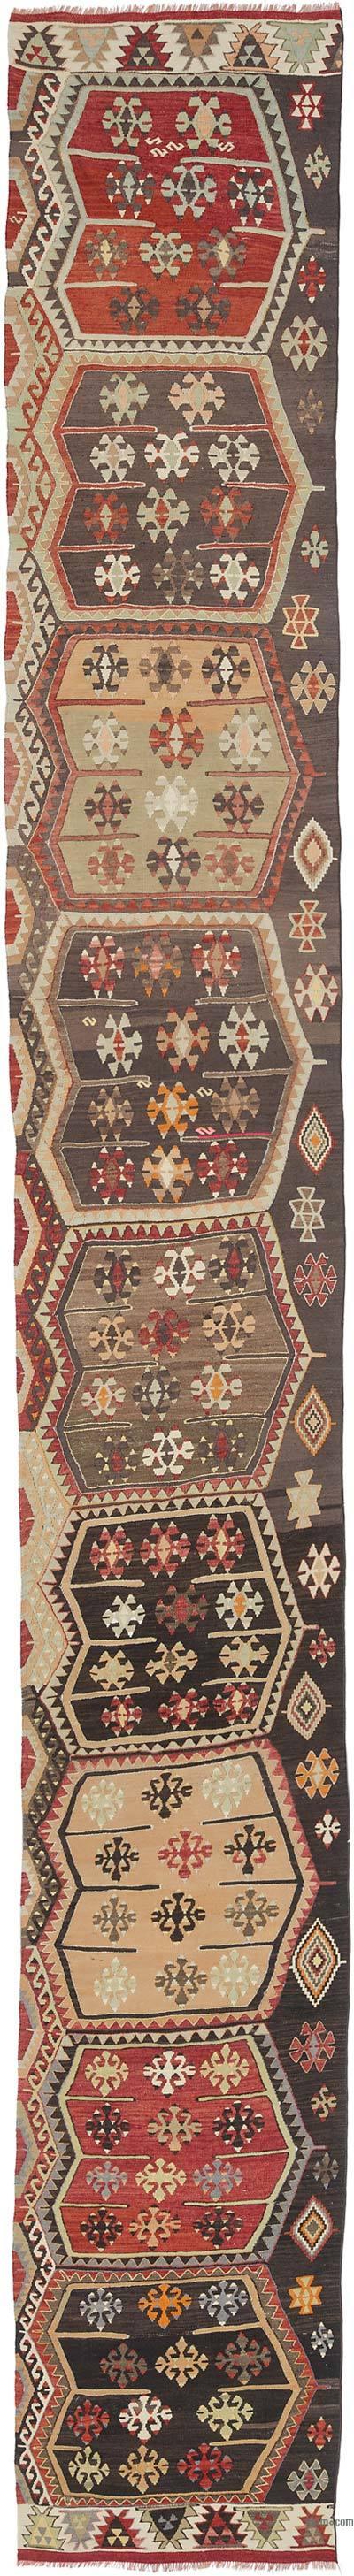 Sivas Kilim Yolluk - 85 cm x 665 cm